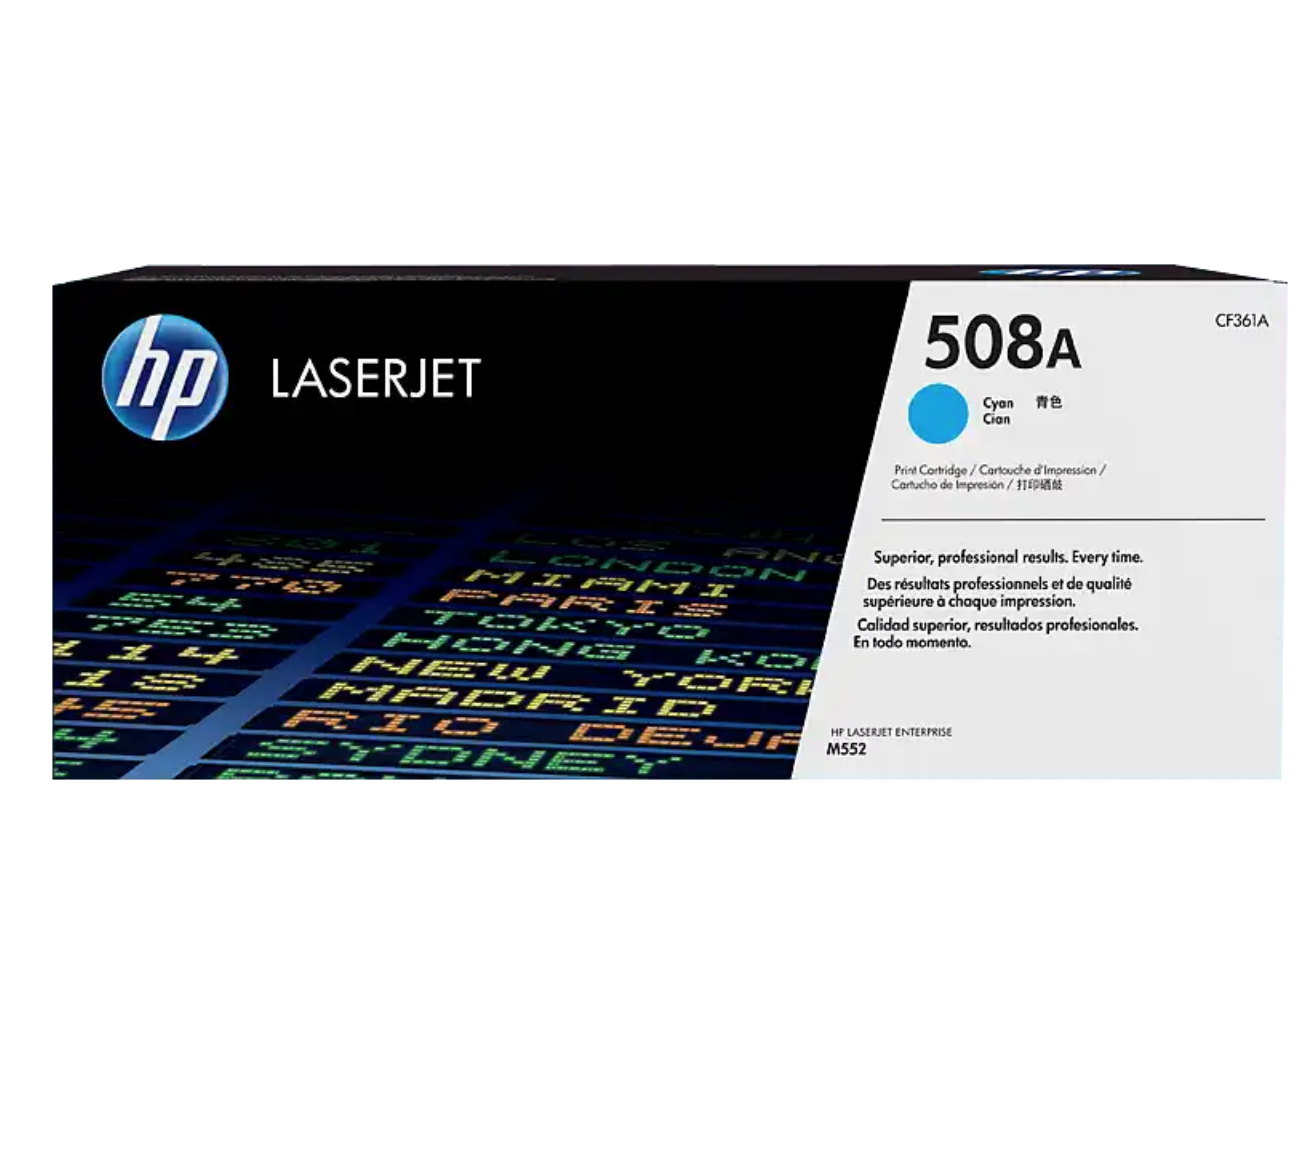 HP 508A 靛藍原廠 LaserJet 碳粉 CF361A